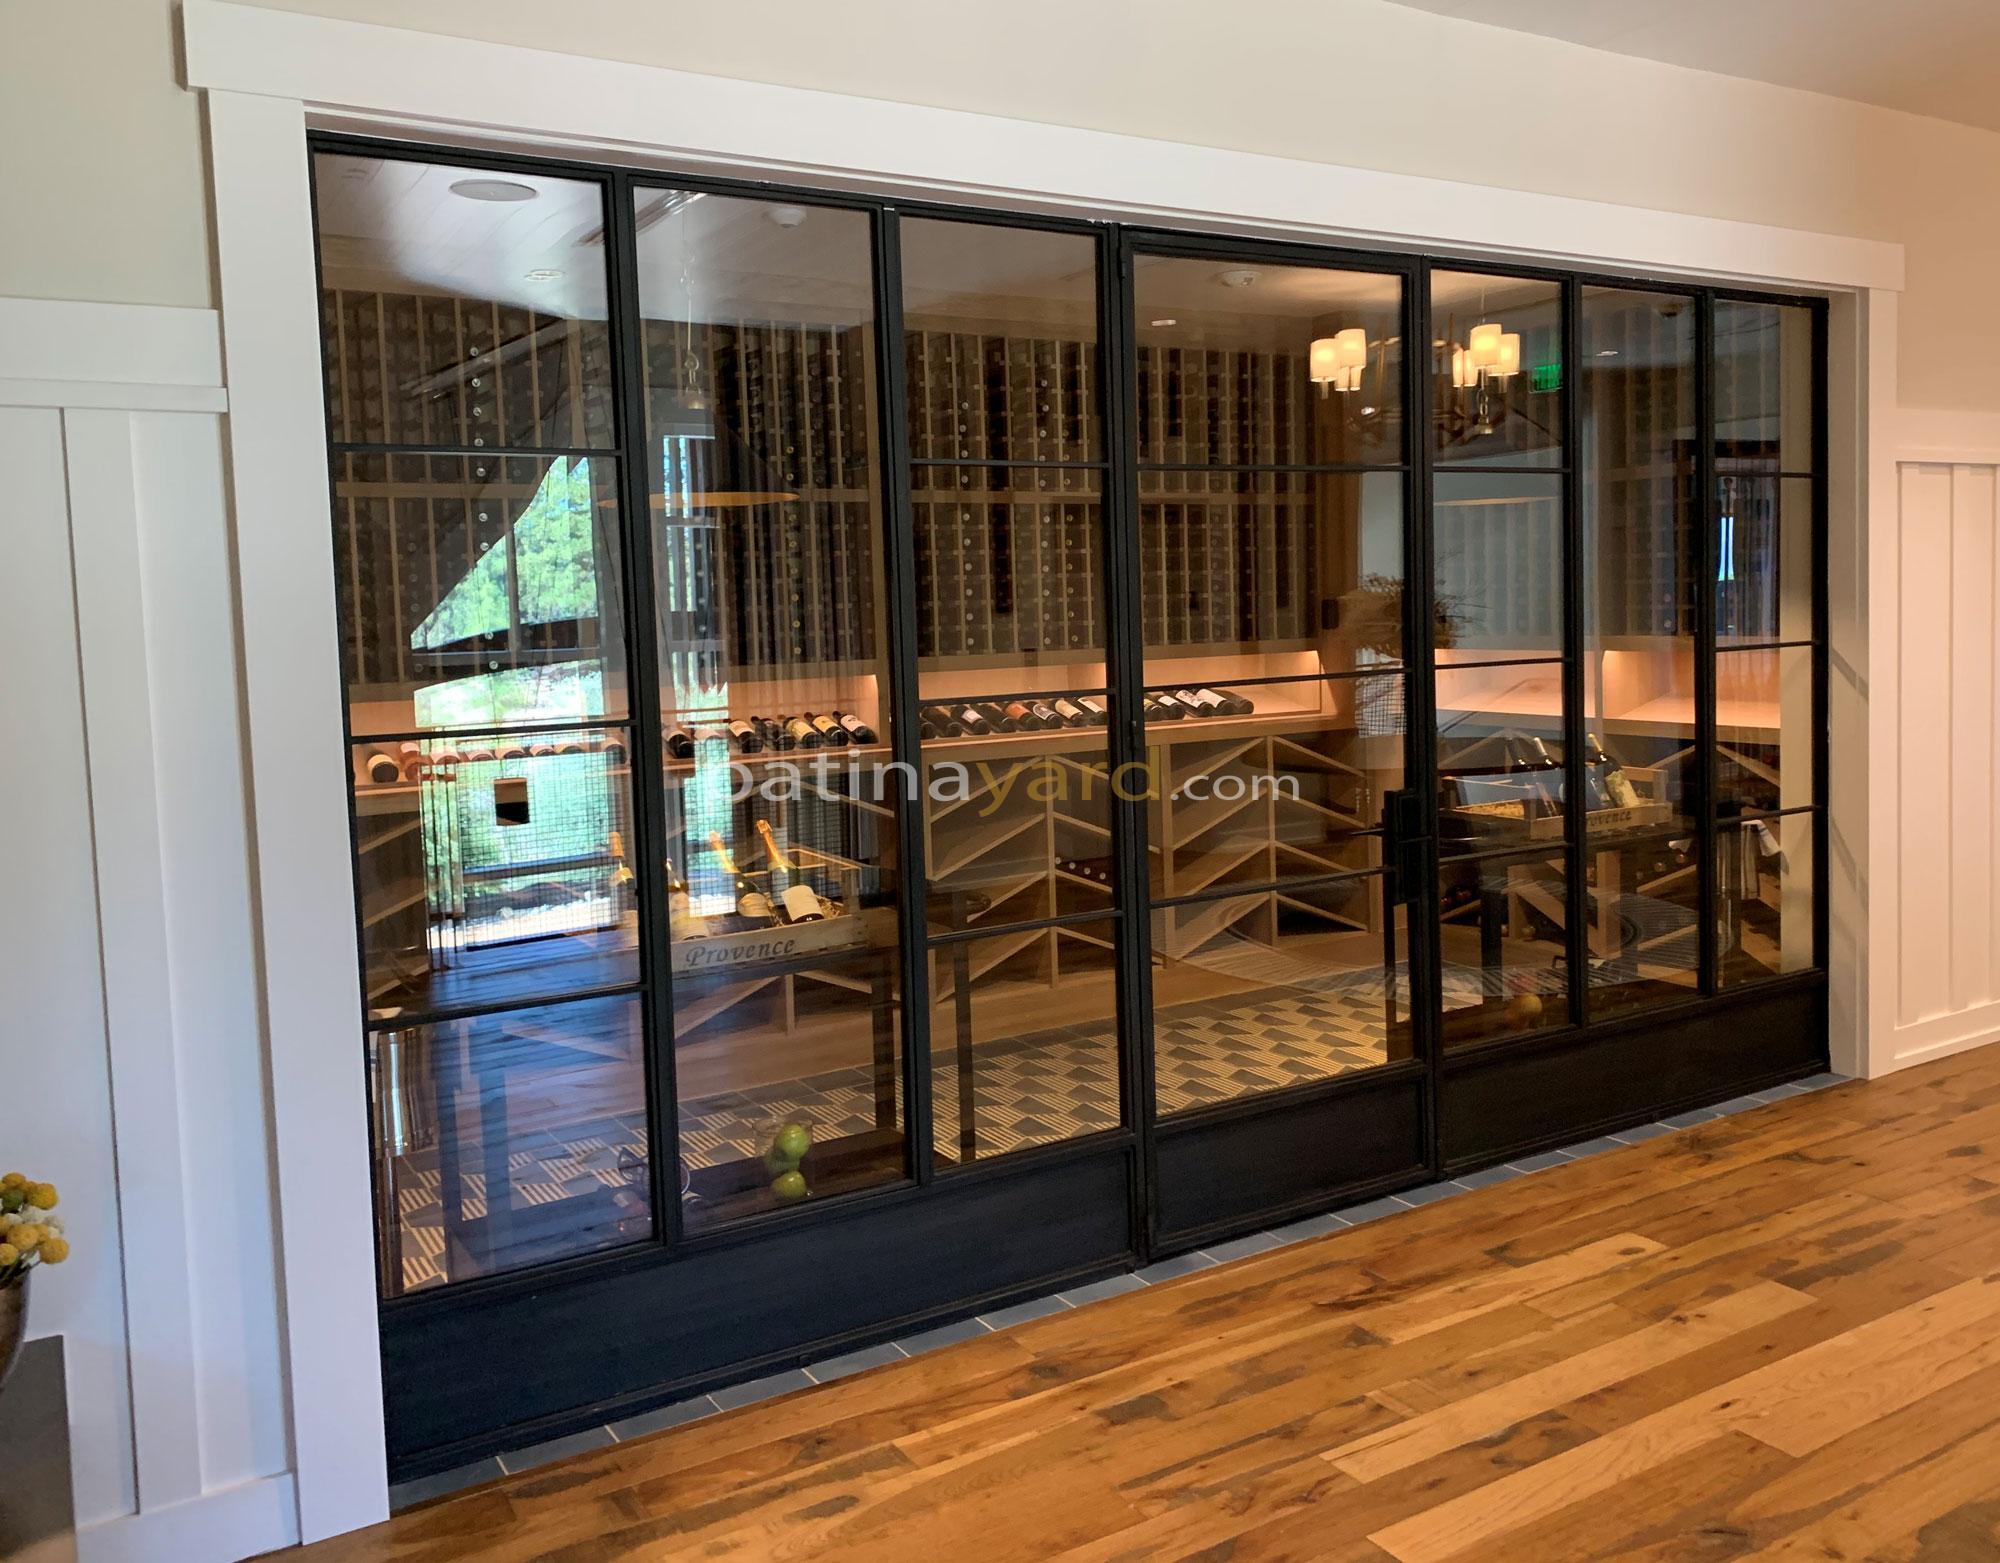 Custom Steel and Glass Windows and Doors